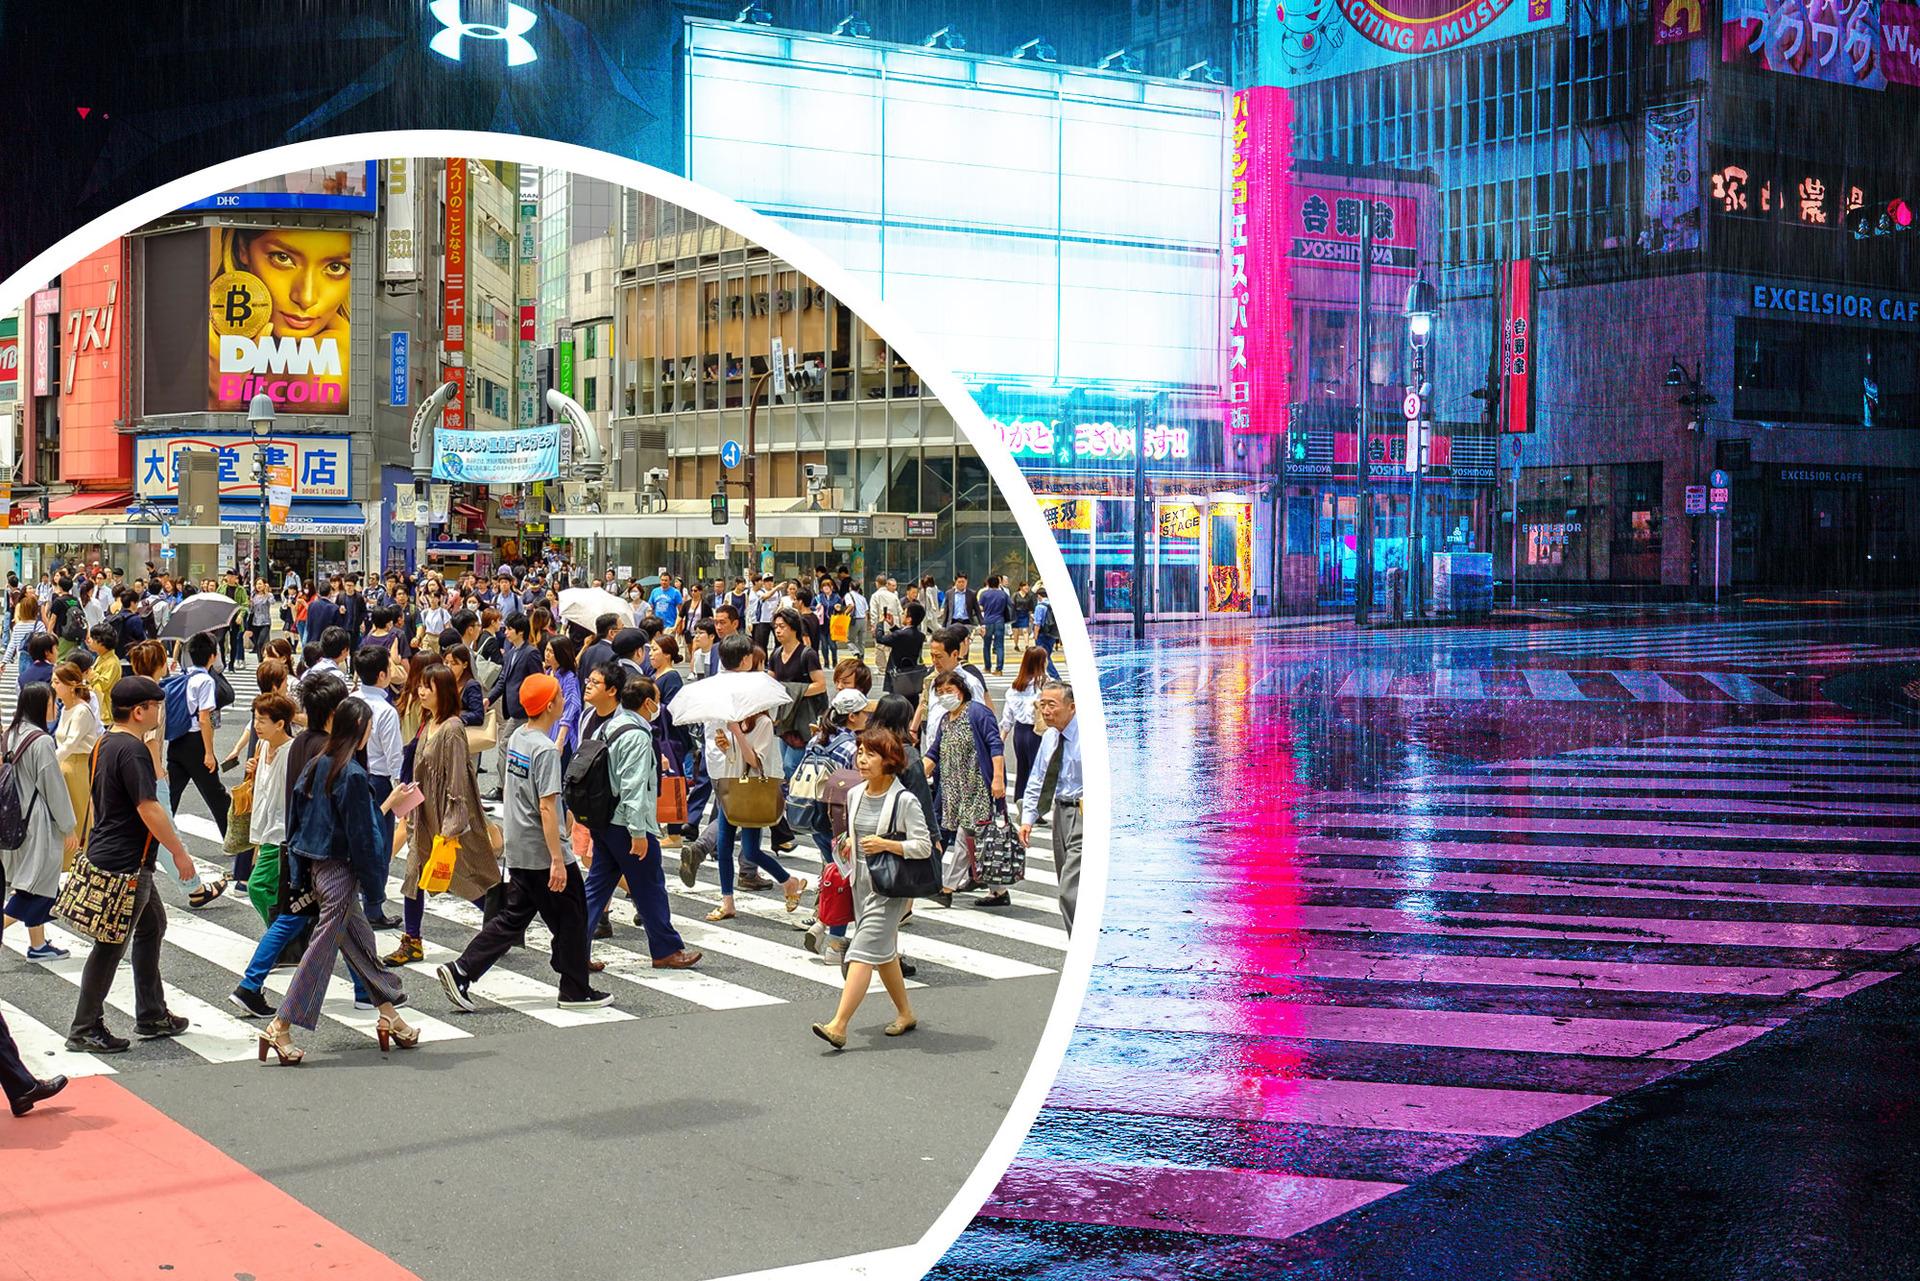 Tokyo's Shibuya crossing emptied in eerie photos